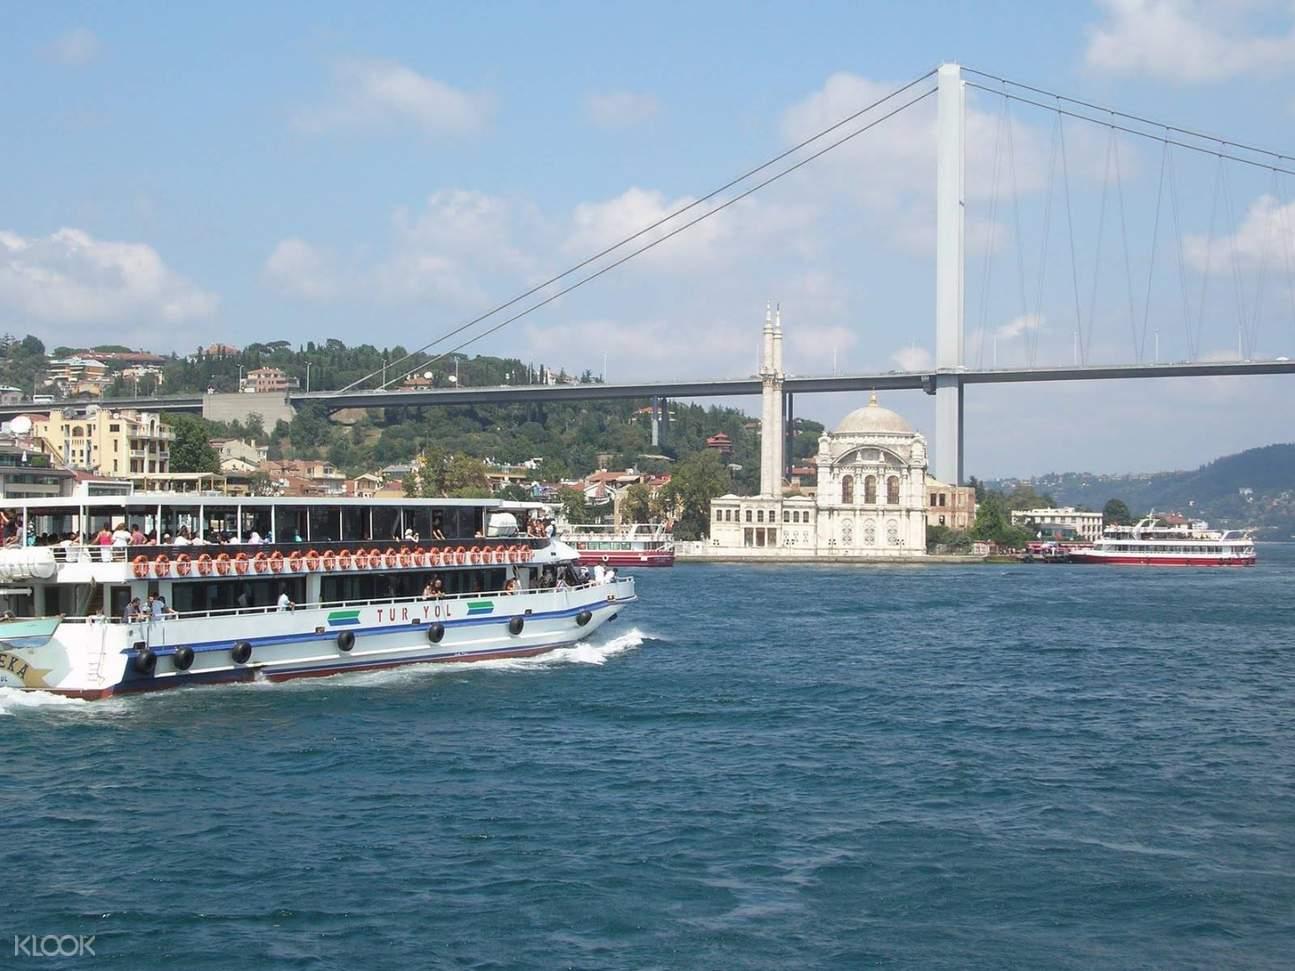 bosphorus strait cruise in turkey golden horn